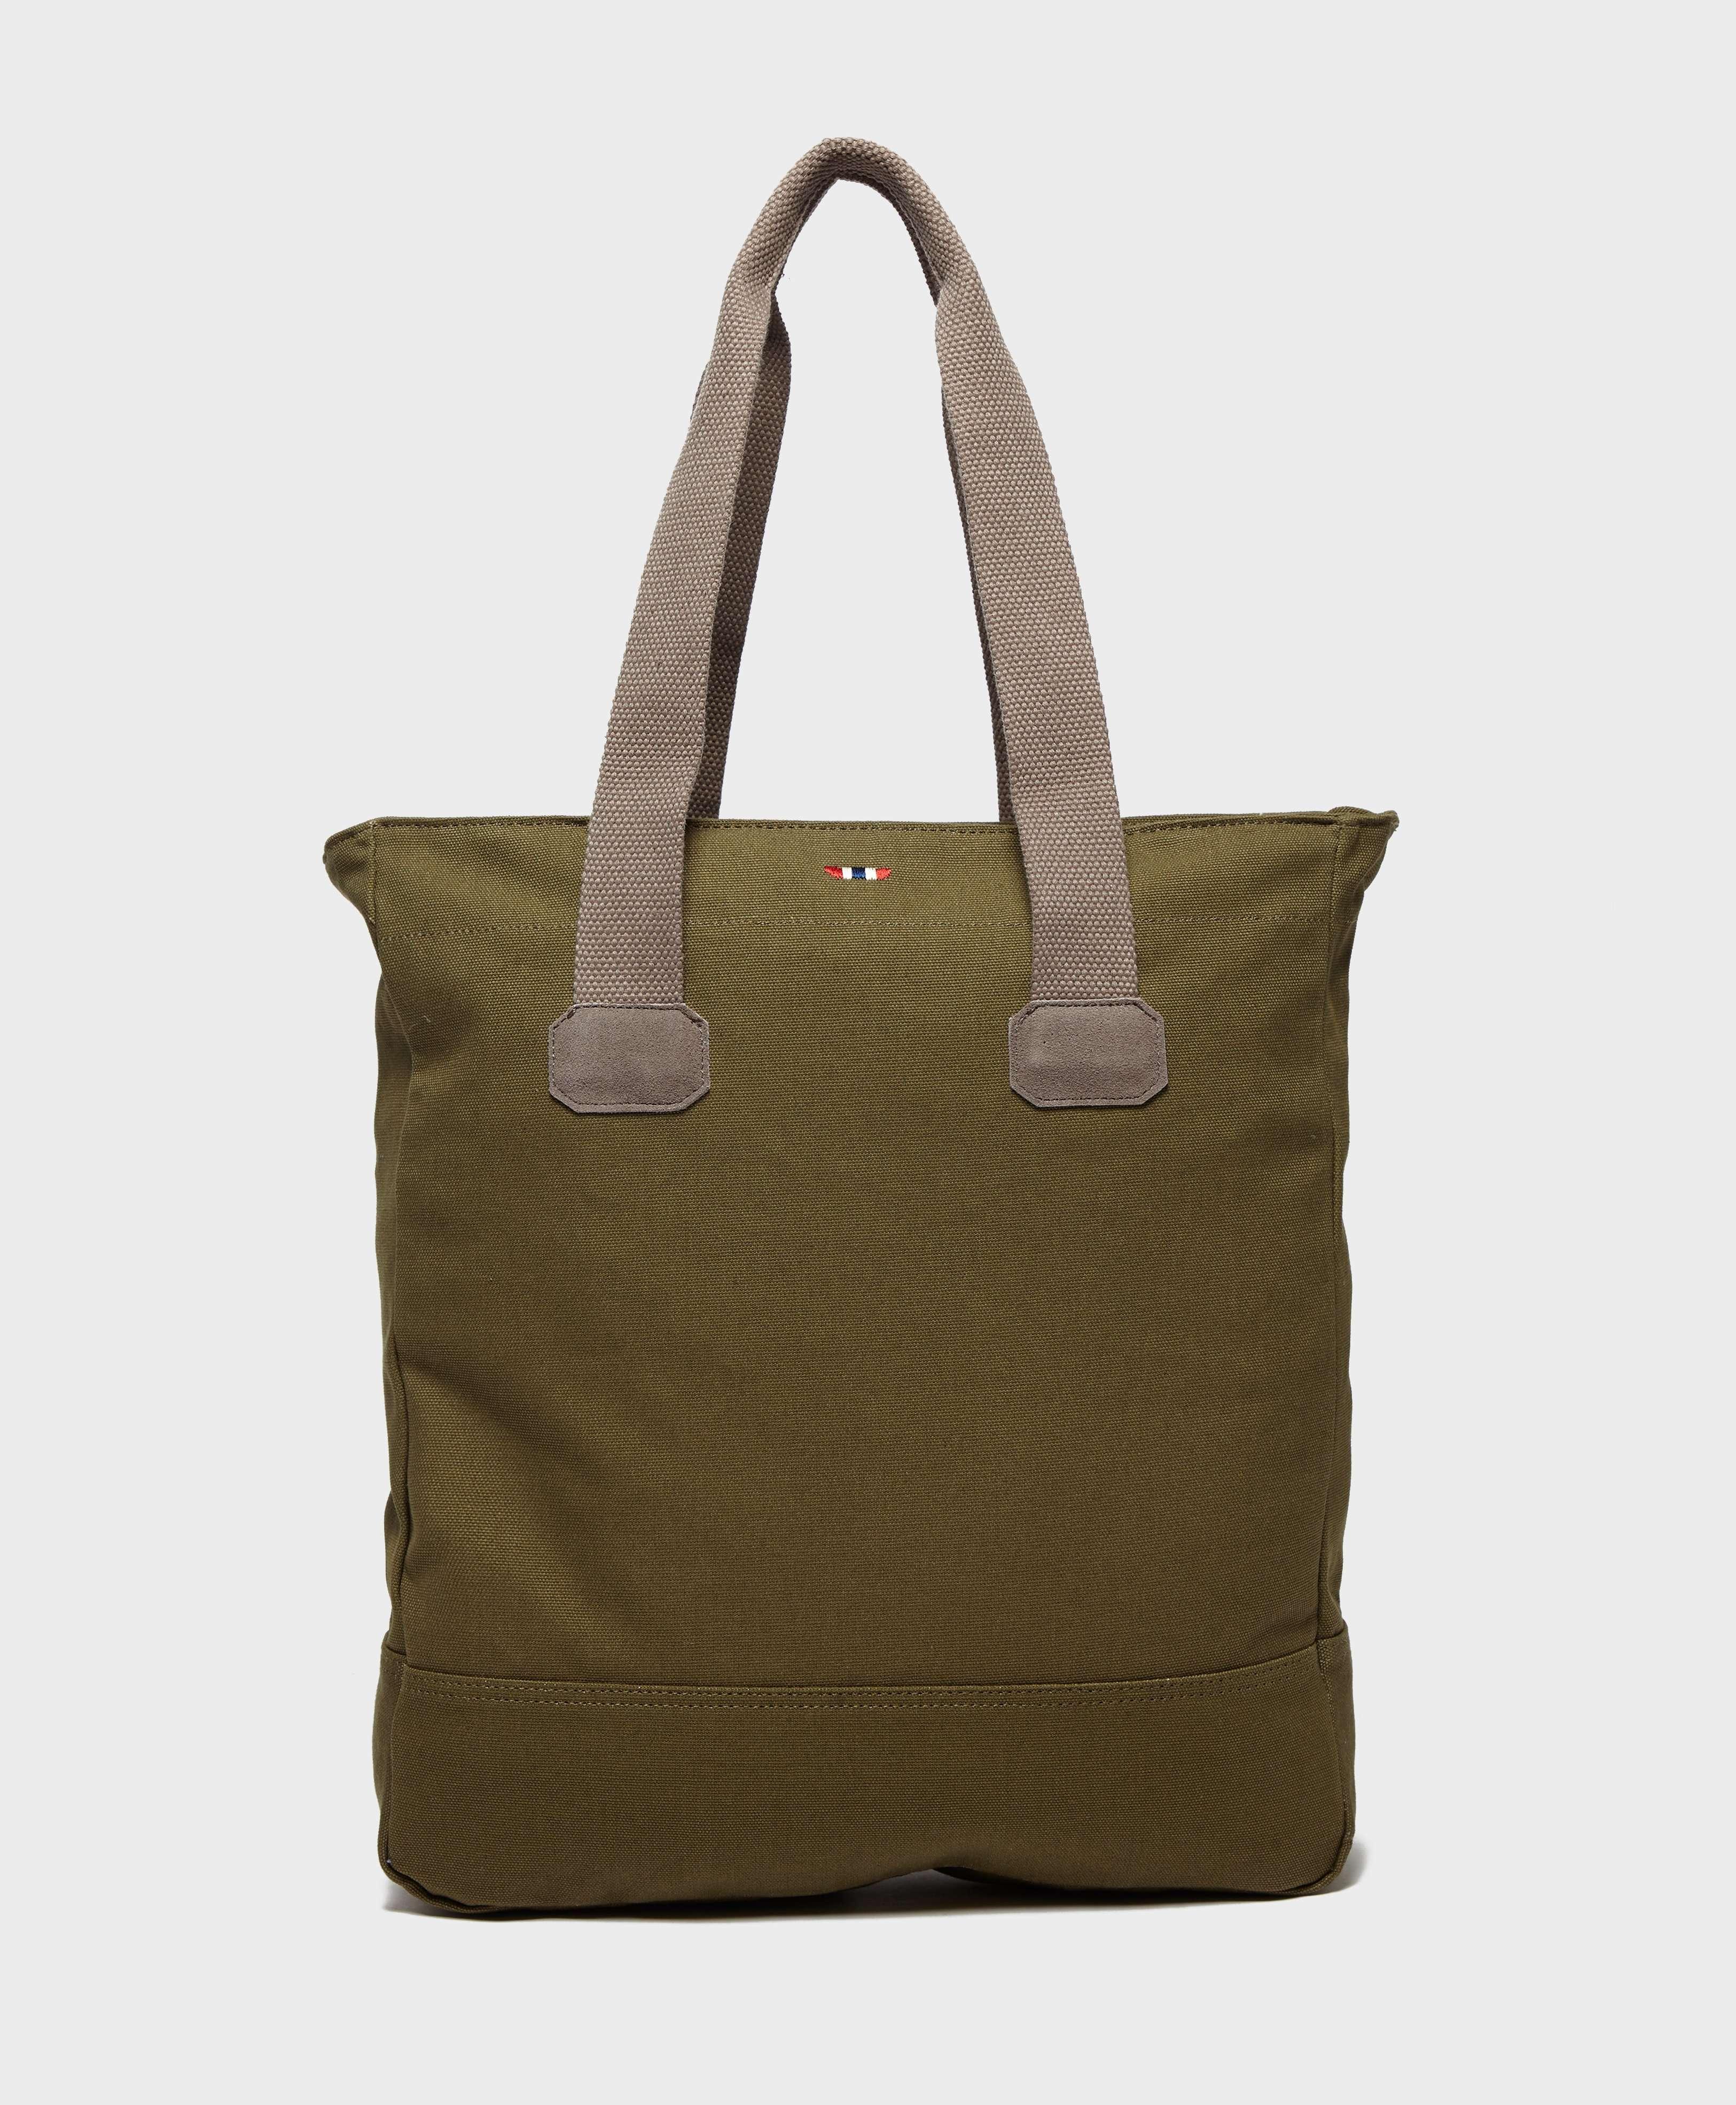 Napapijri Sporta Tote Bag